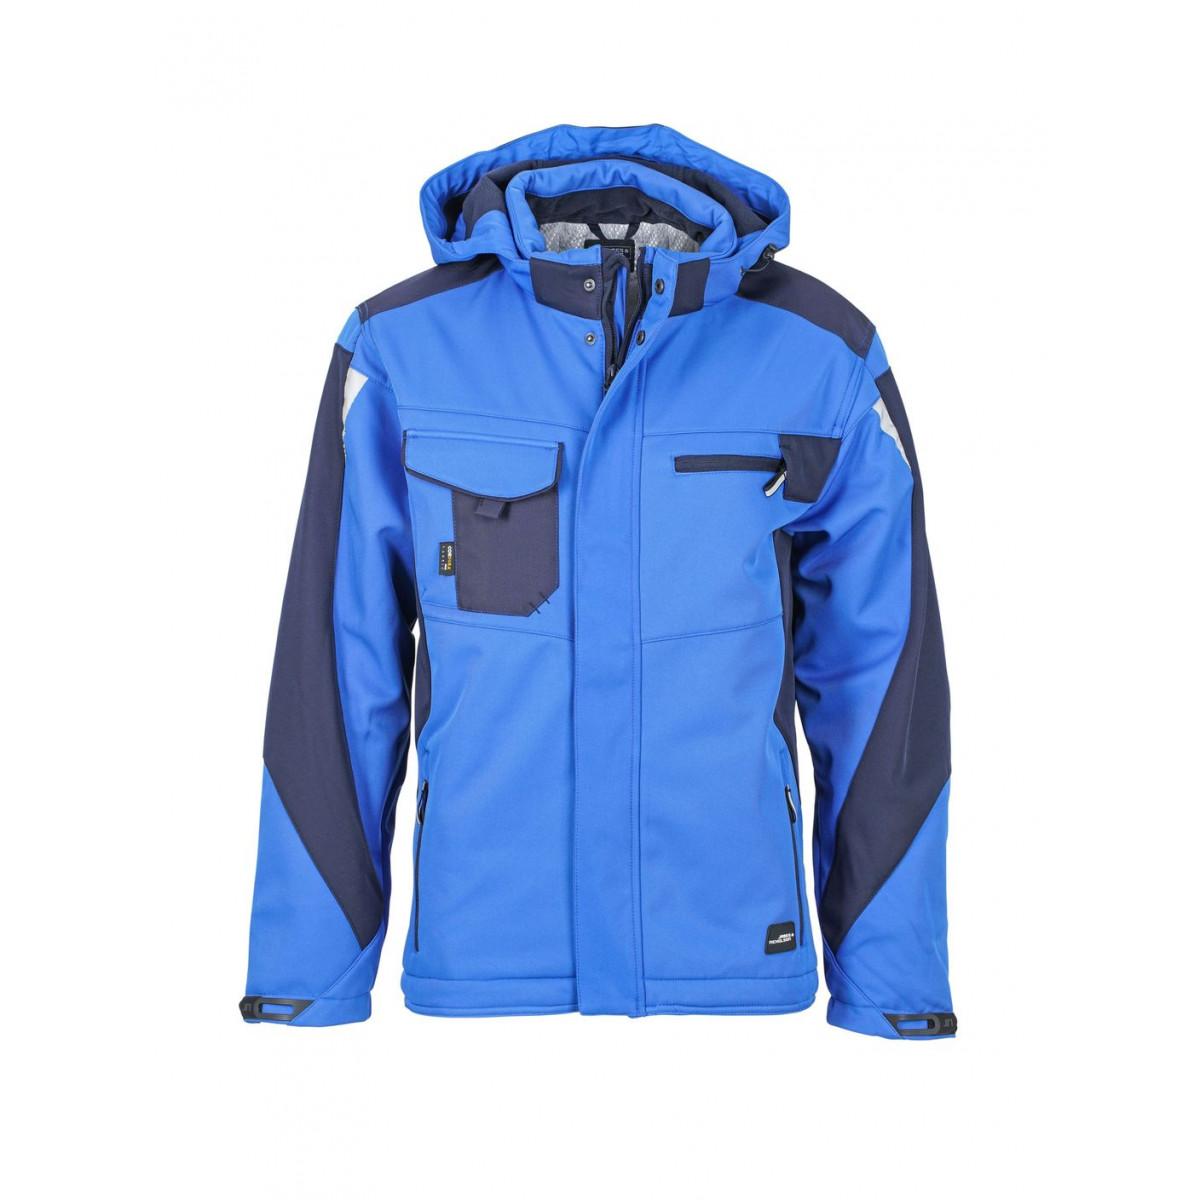 Куртка мужская JN824 Craftsmen Softshell Jacket - Ярко-синий/Темно-синий